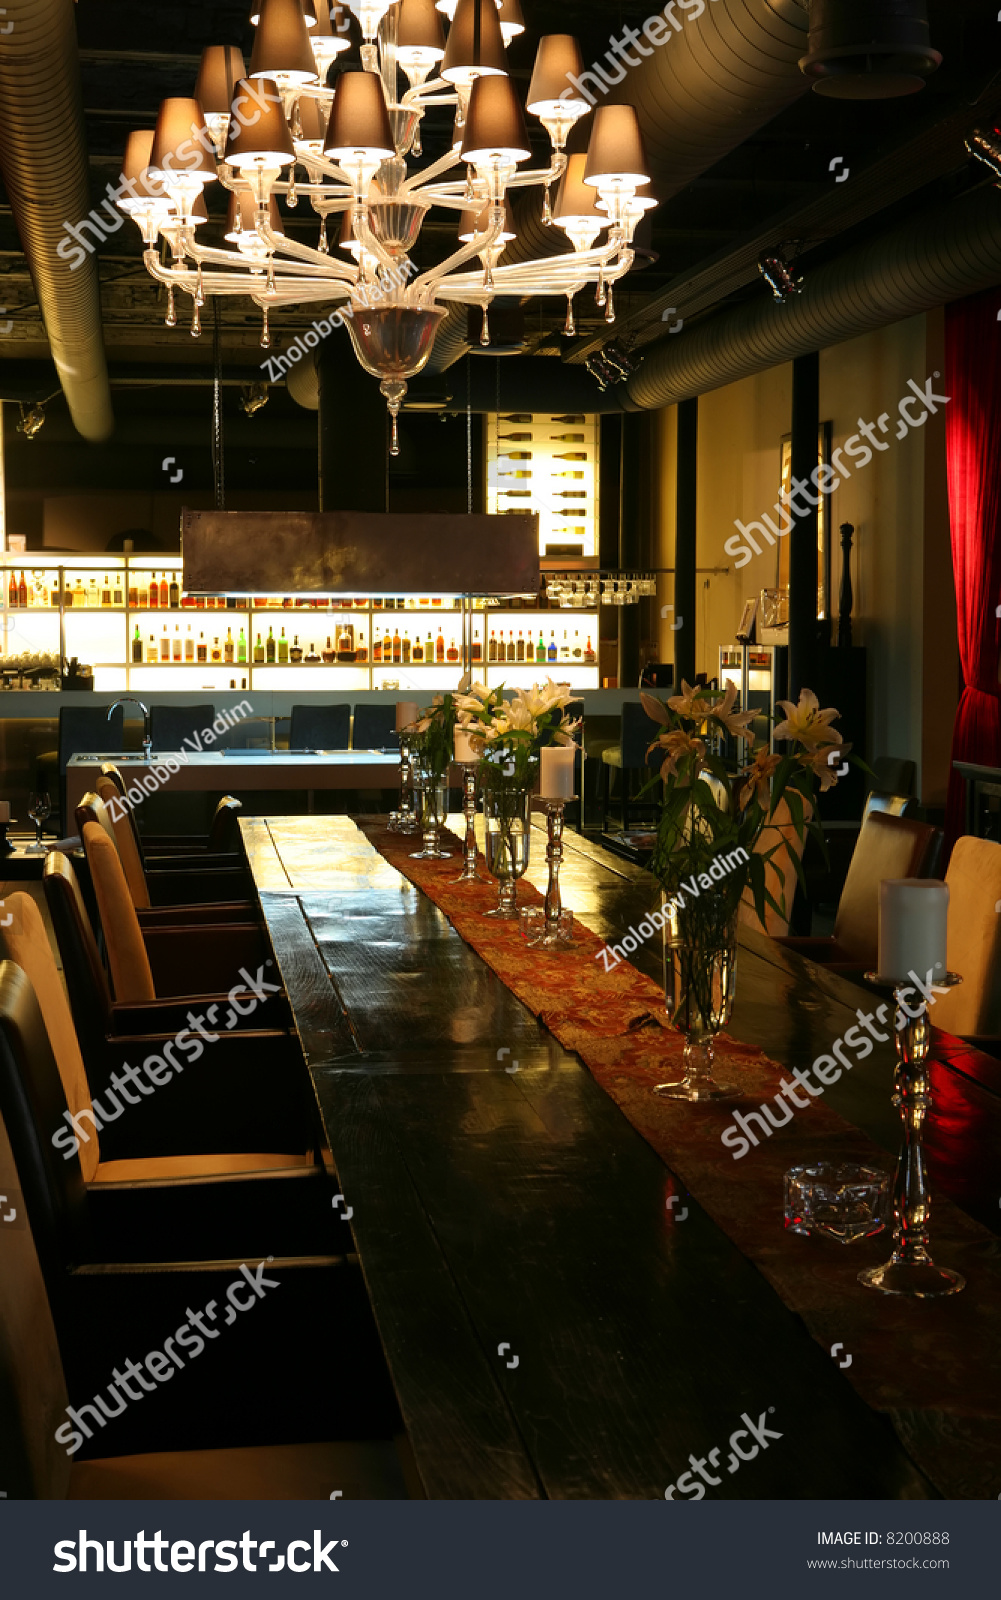 Interior of the restaurant in dark red tone stock photo